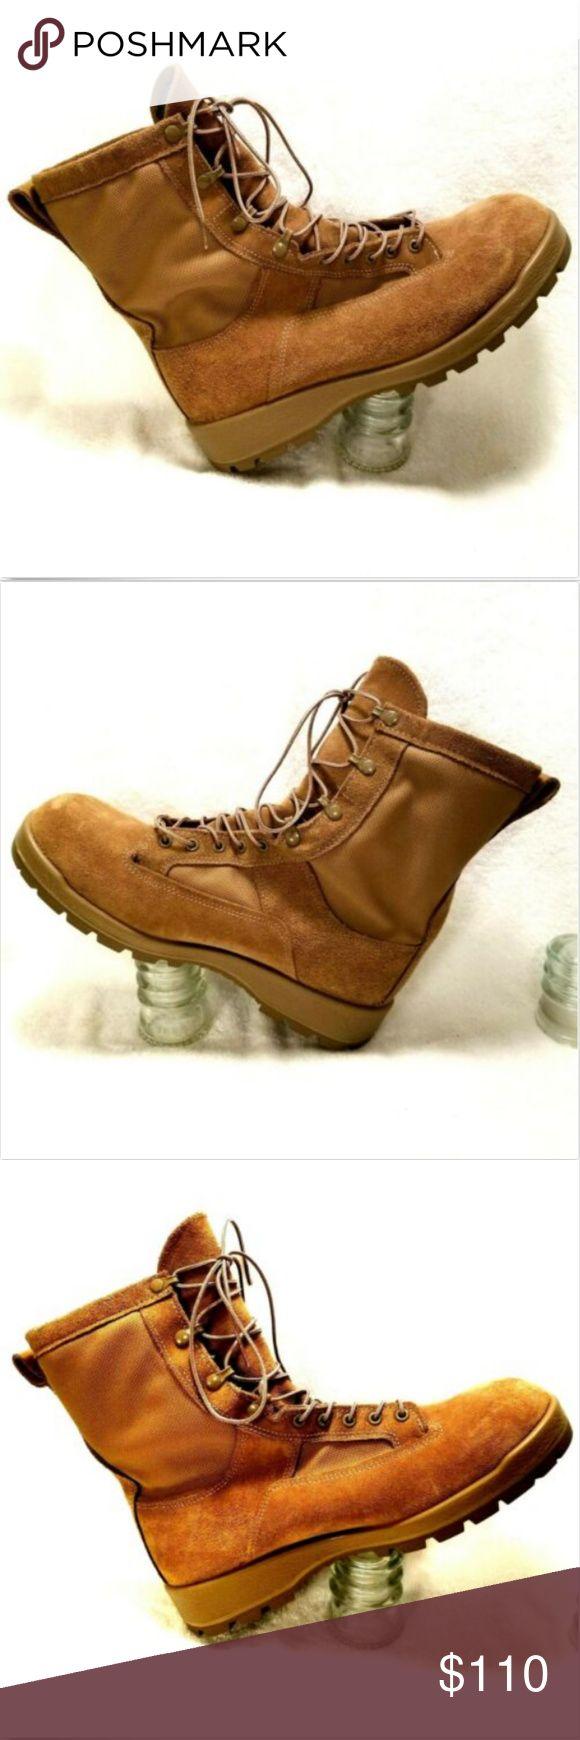 Bates Military Flight Combat Crewmen Boots 11w Bates Men S Military Flight Combat Crewmen Boots Coyote Brown Sz 11 W 291 Fashion Boots Military Boots Boots